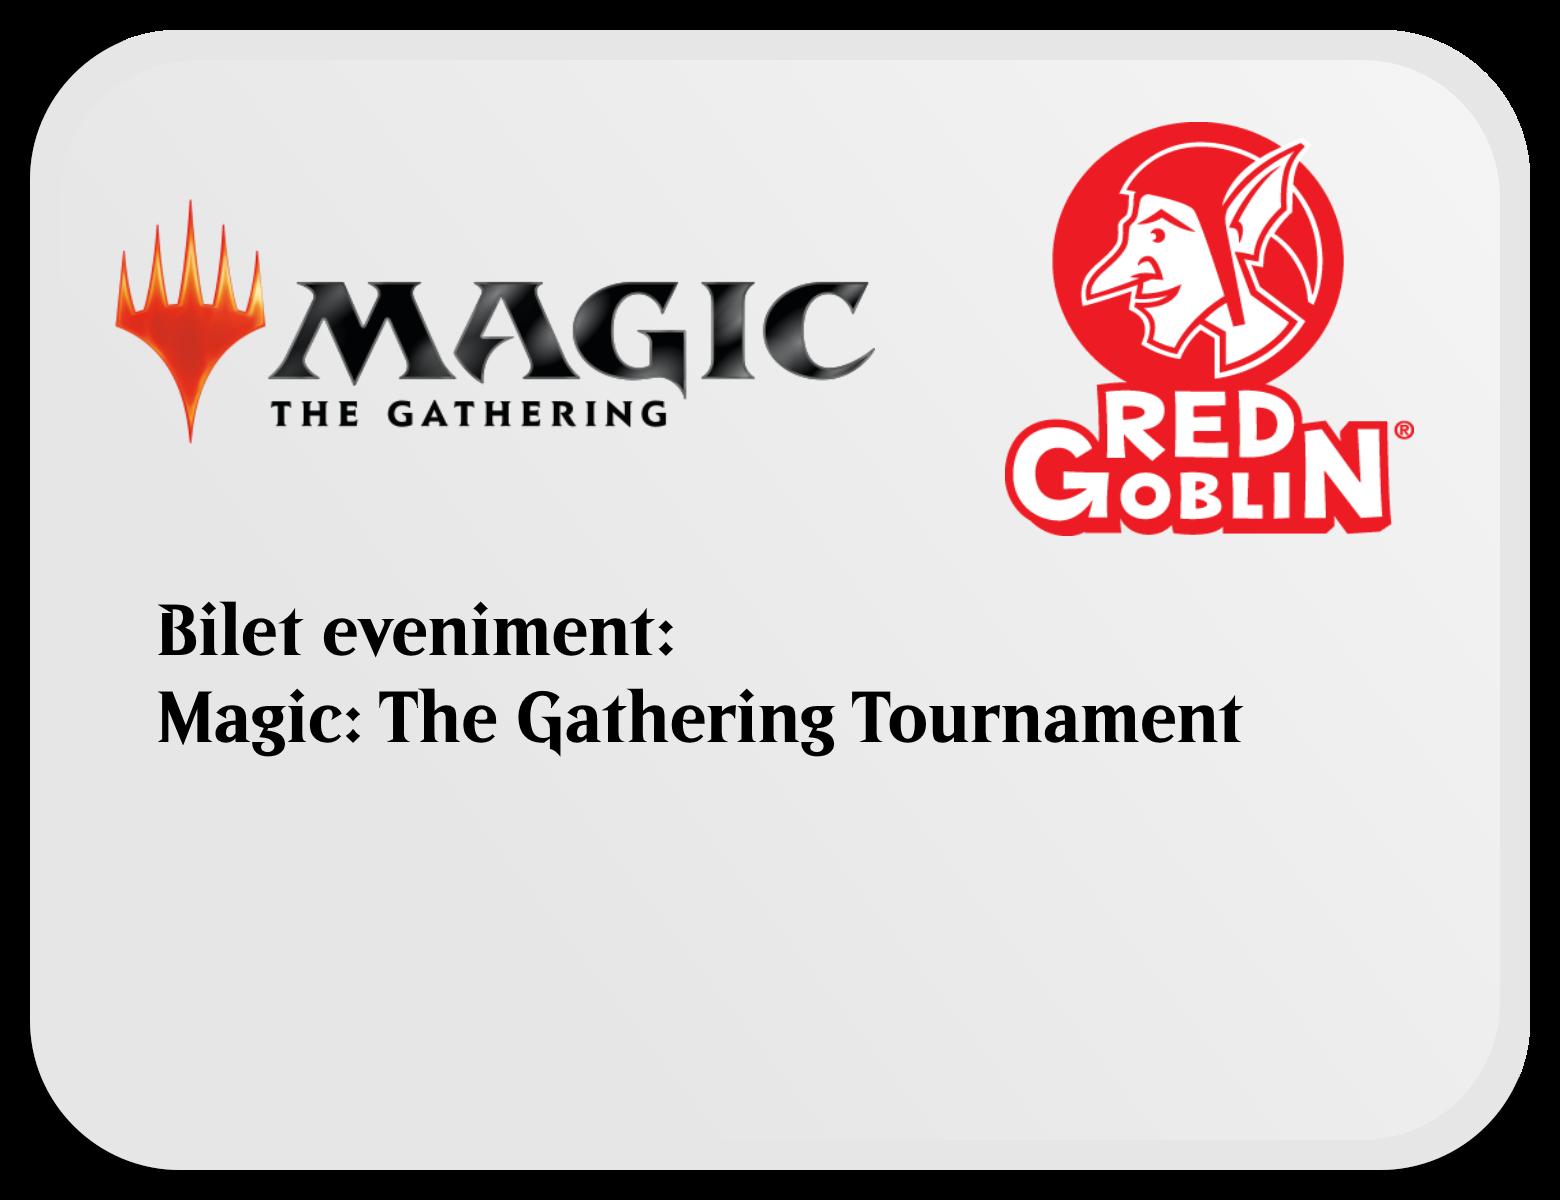 Bilet Eveniment Magic: the Gathering